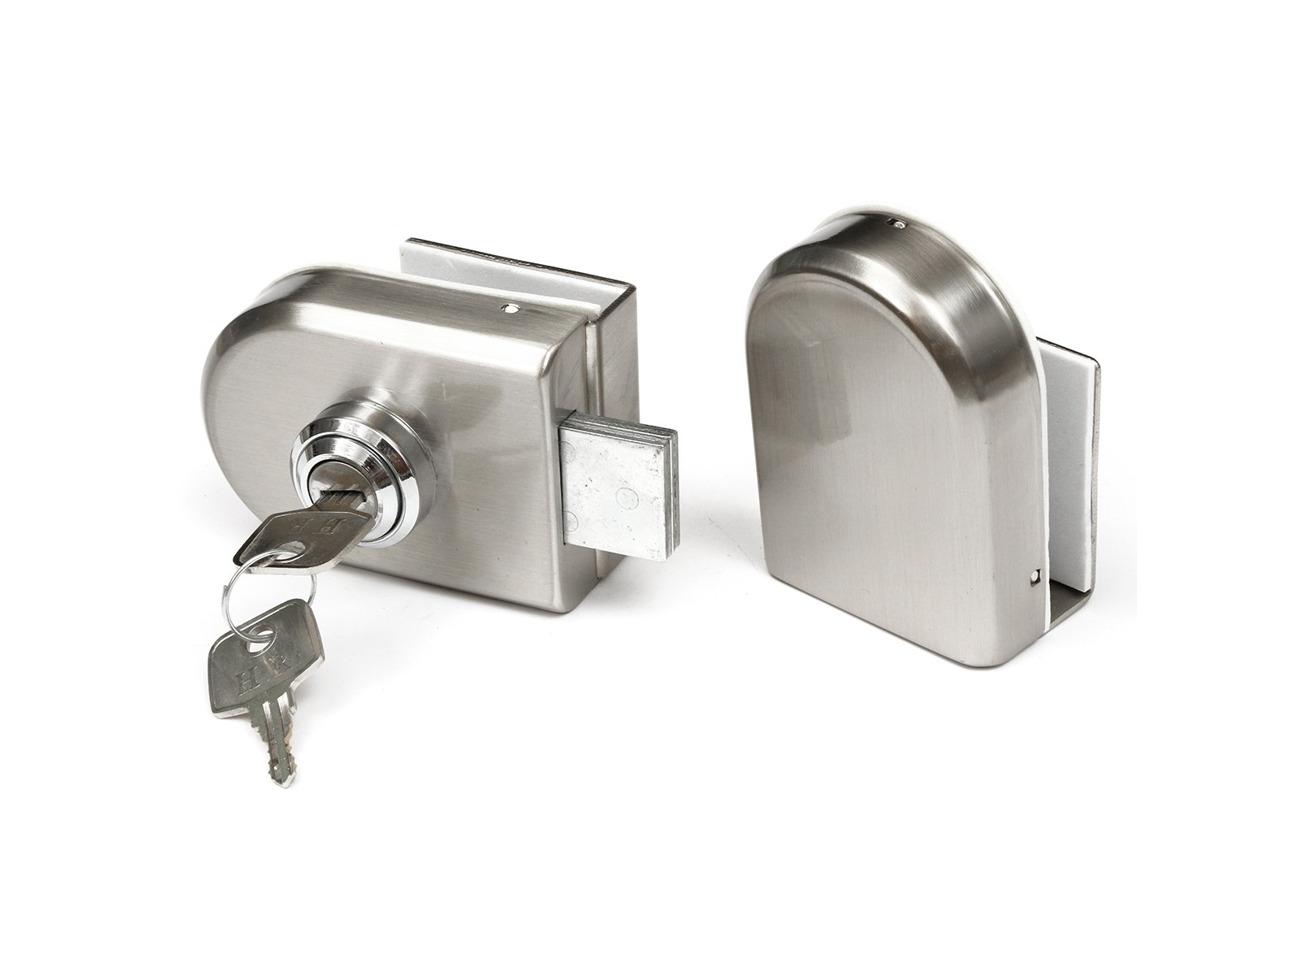 Stainless Steel 12mm Gl Door Lock Double Swing Hinged